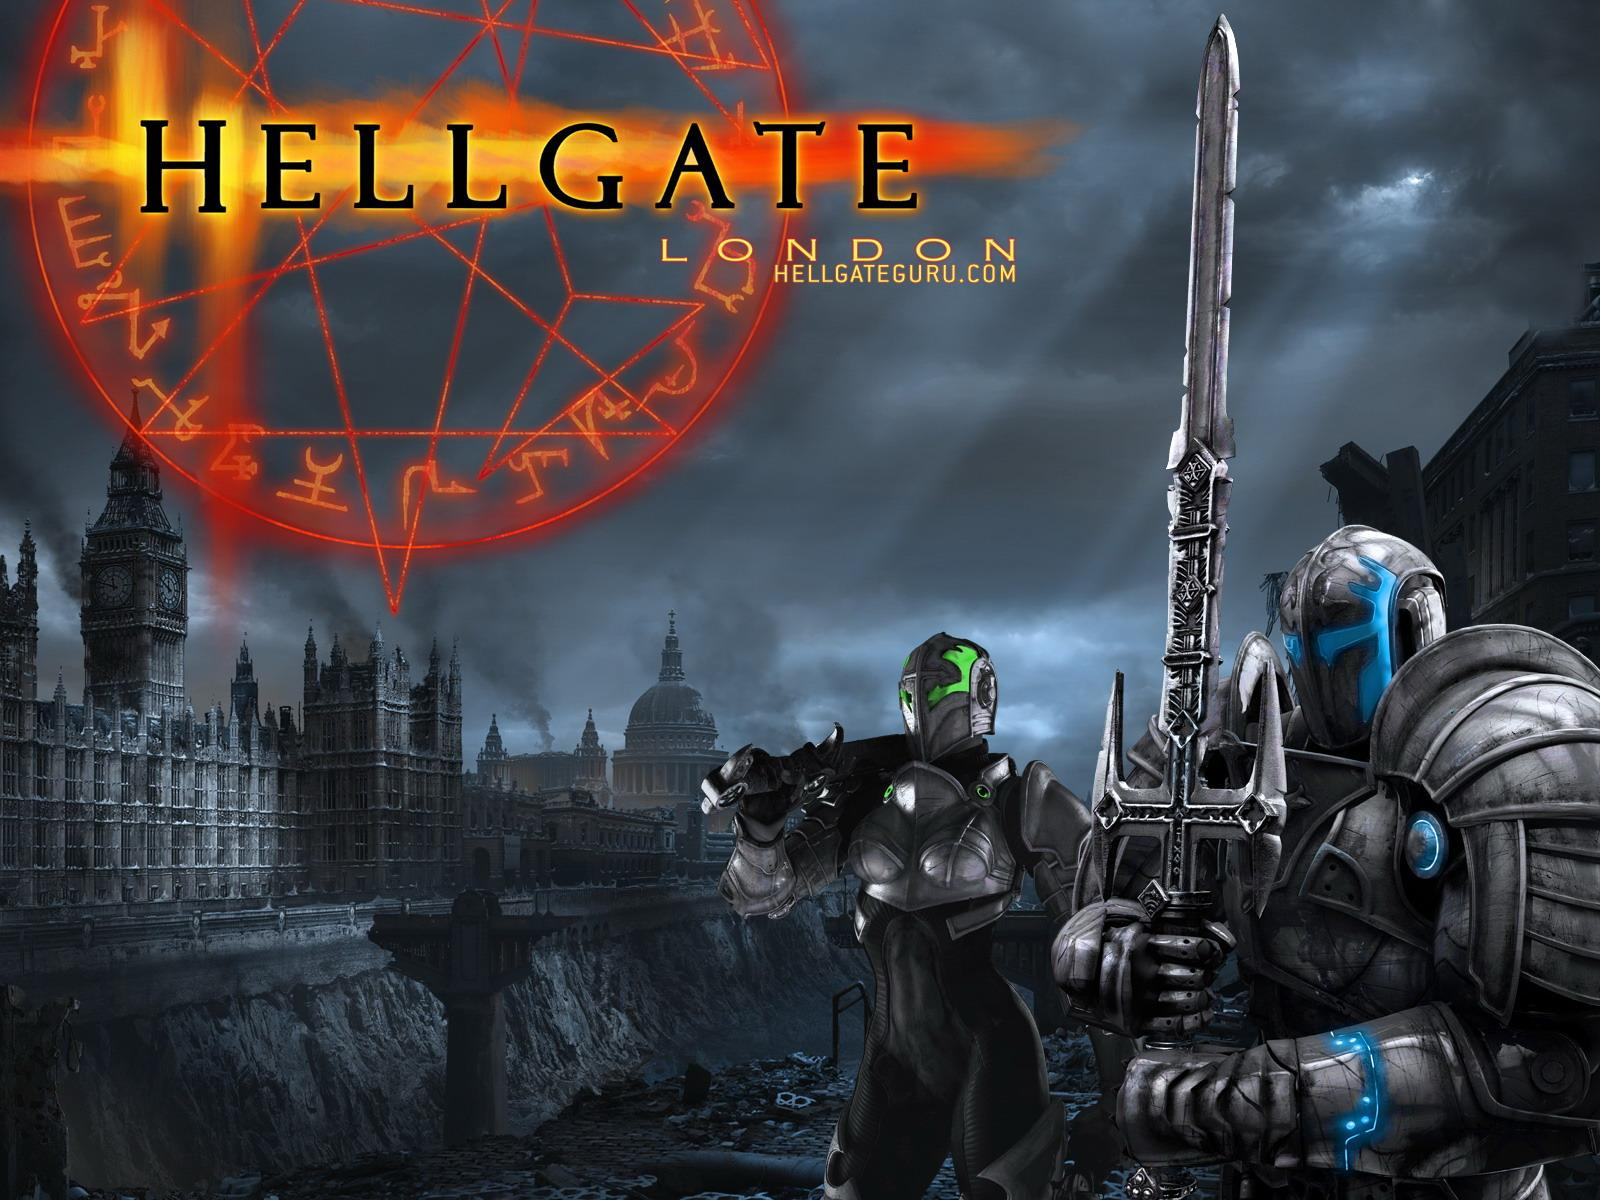 golie-geroi-igri-hellgate-london